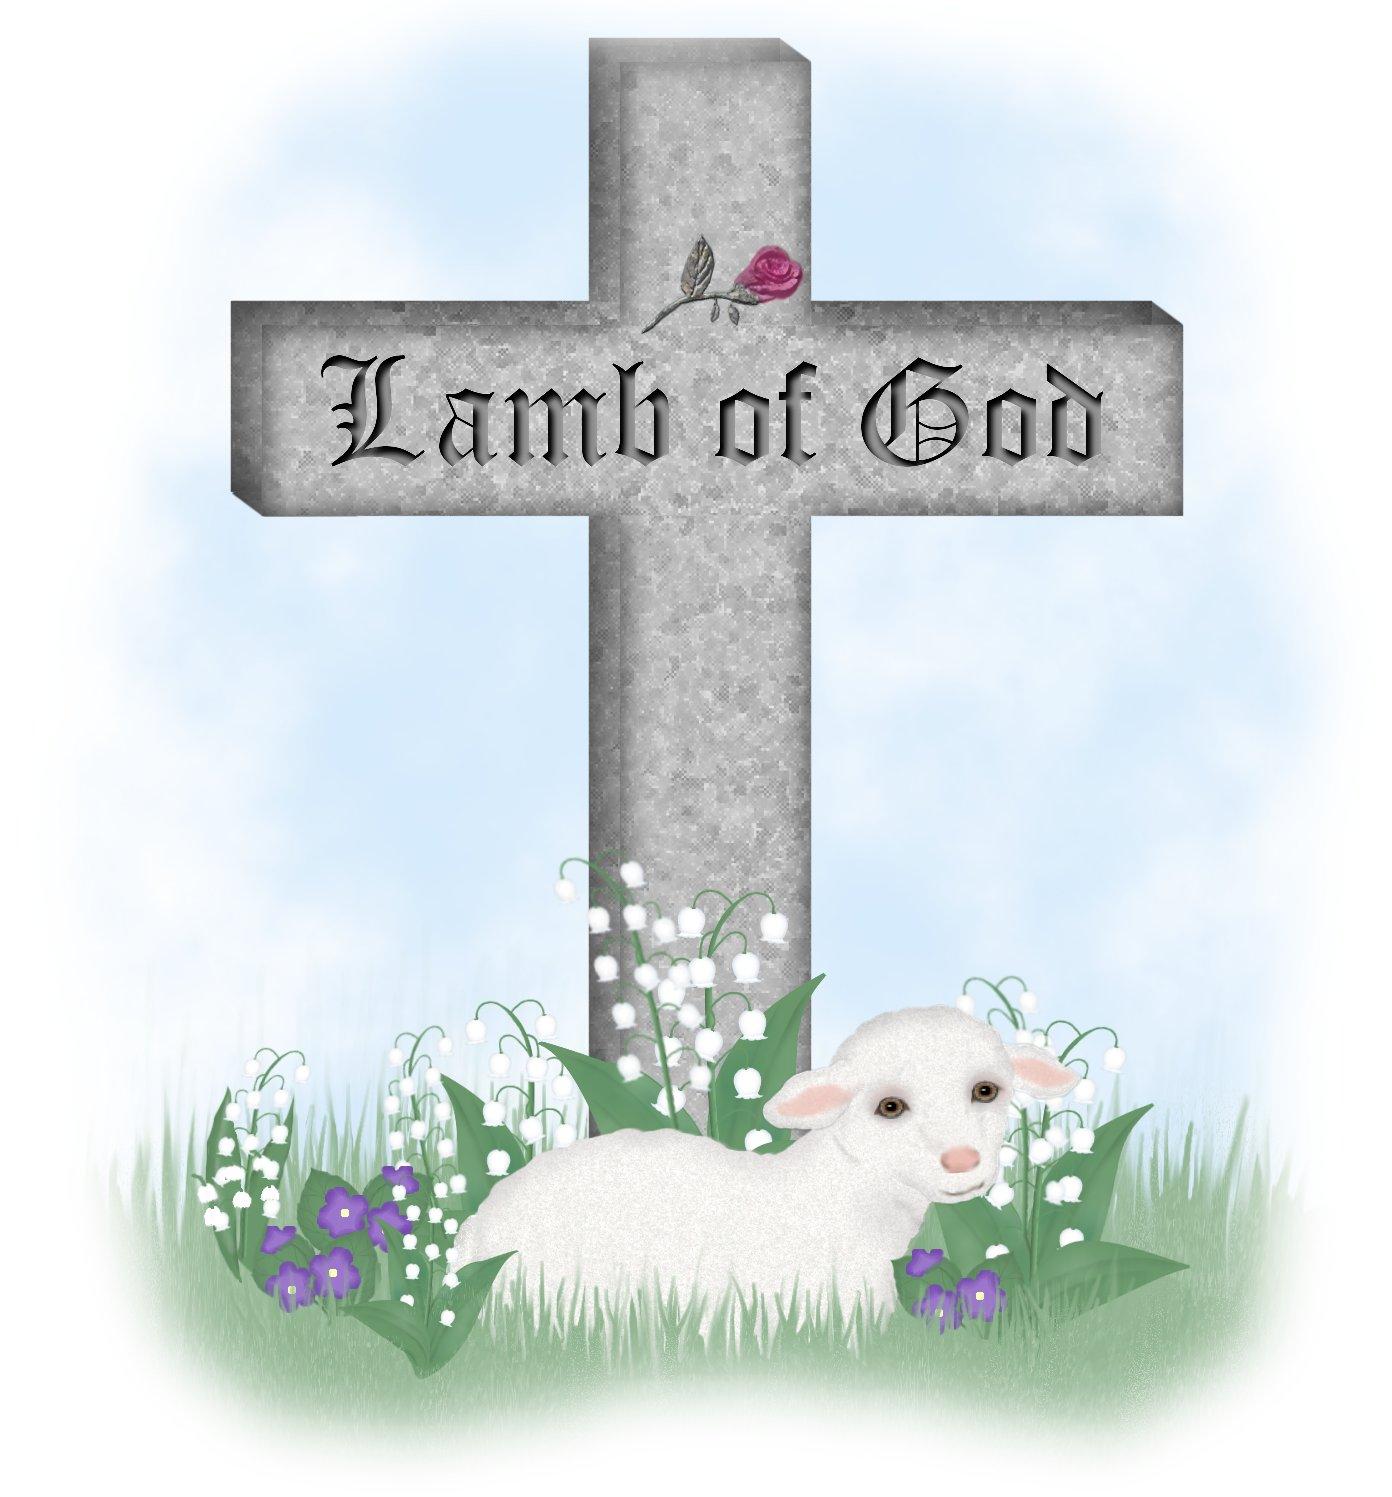 clipart jesus lamb of god - photo #13